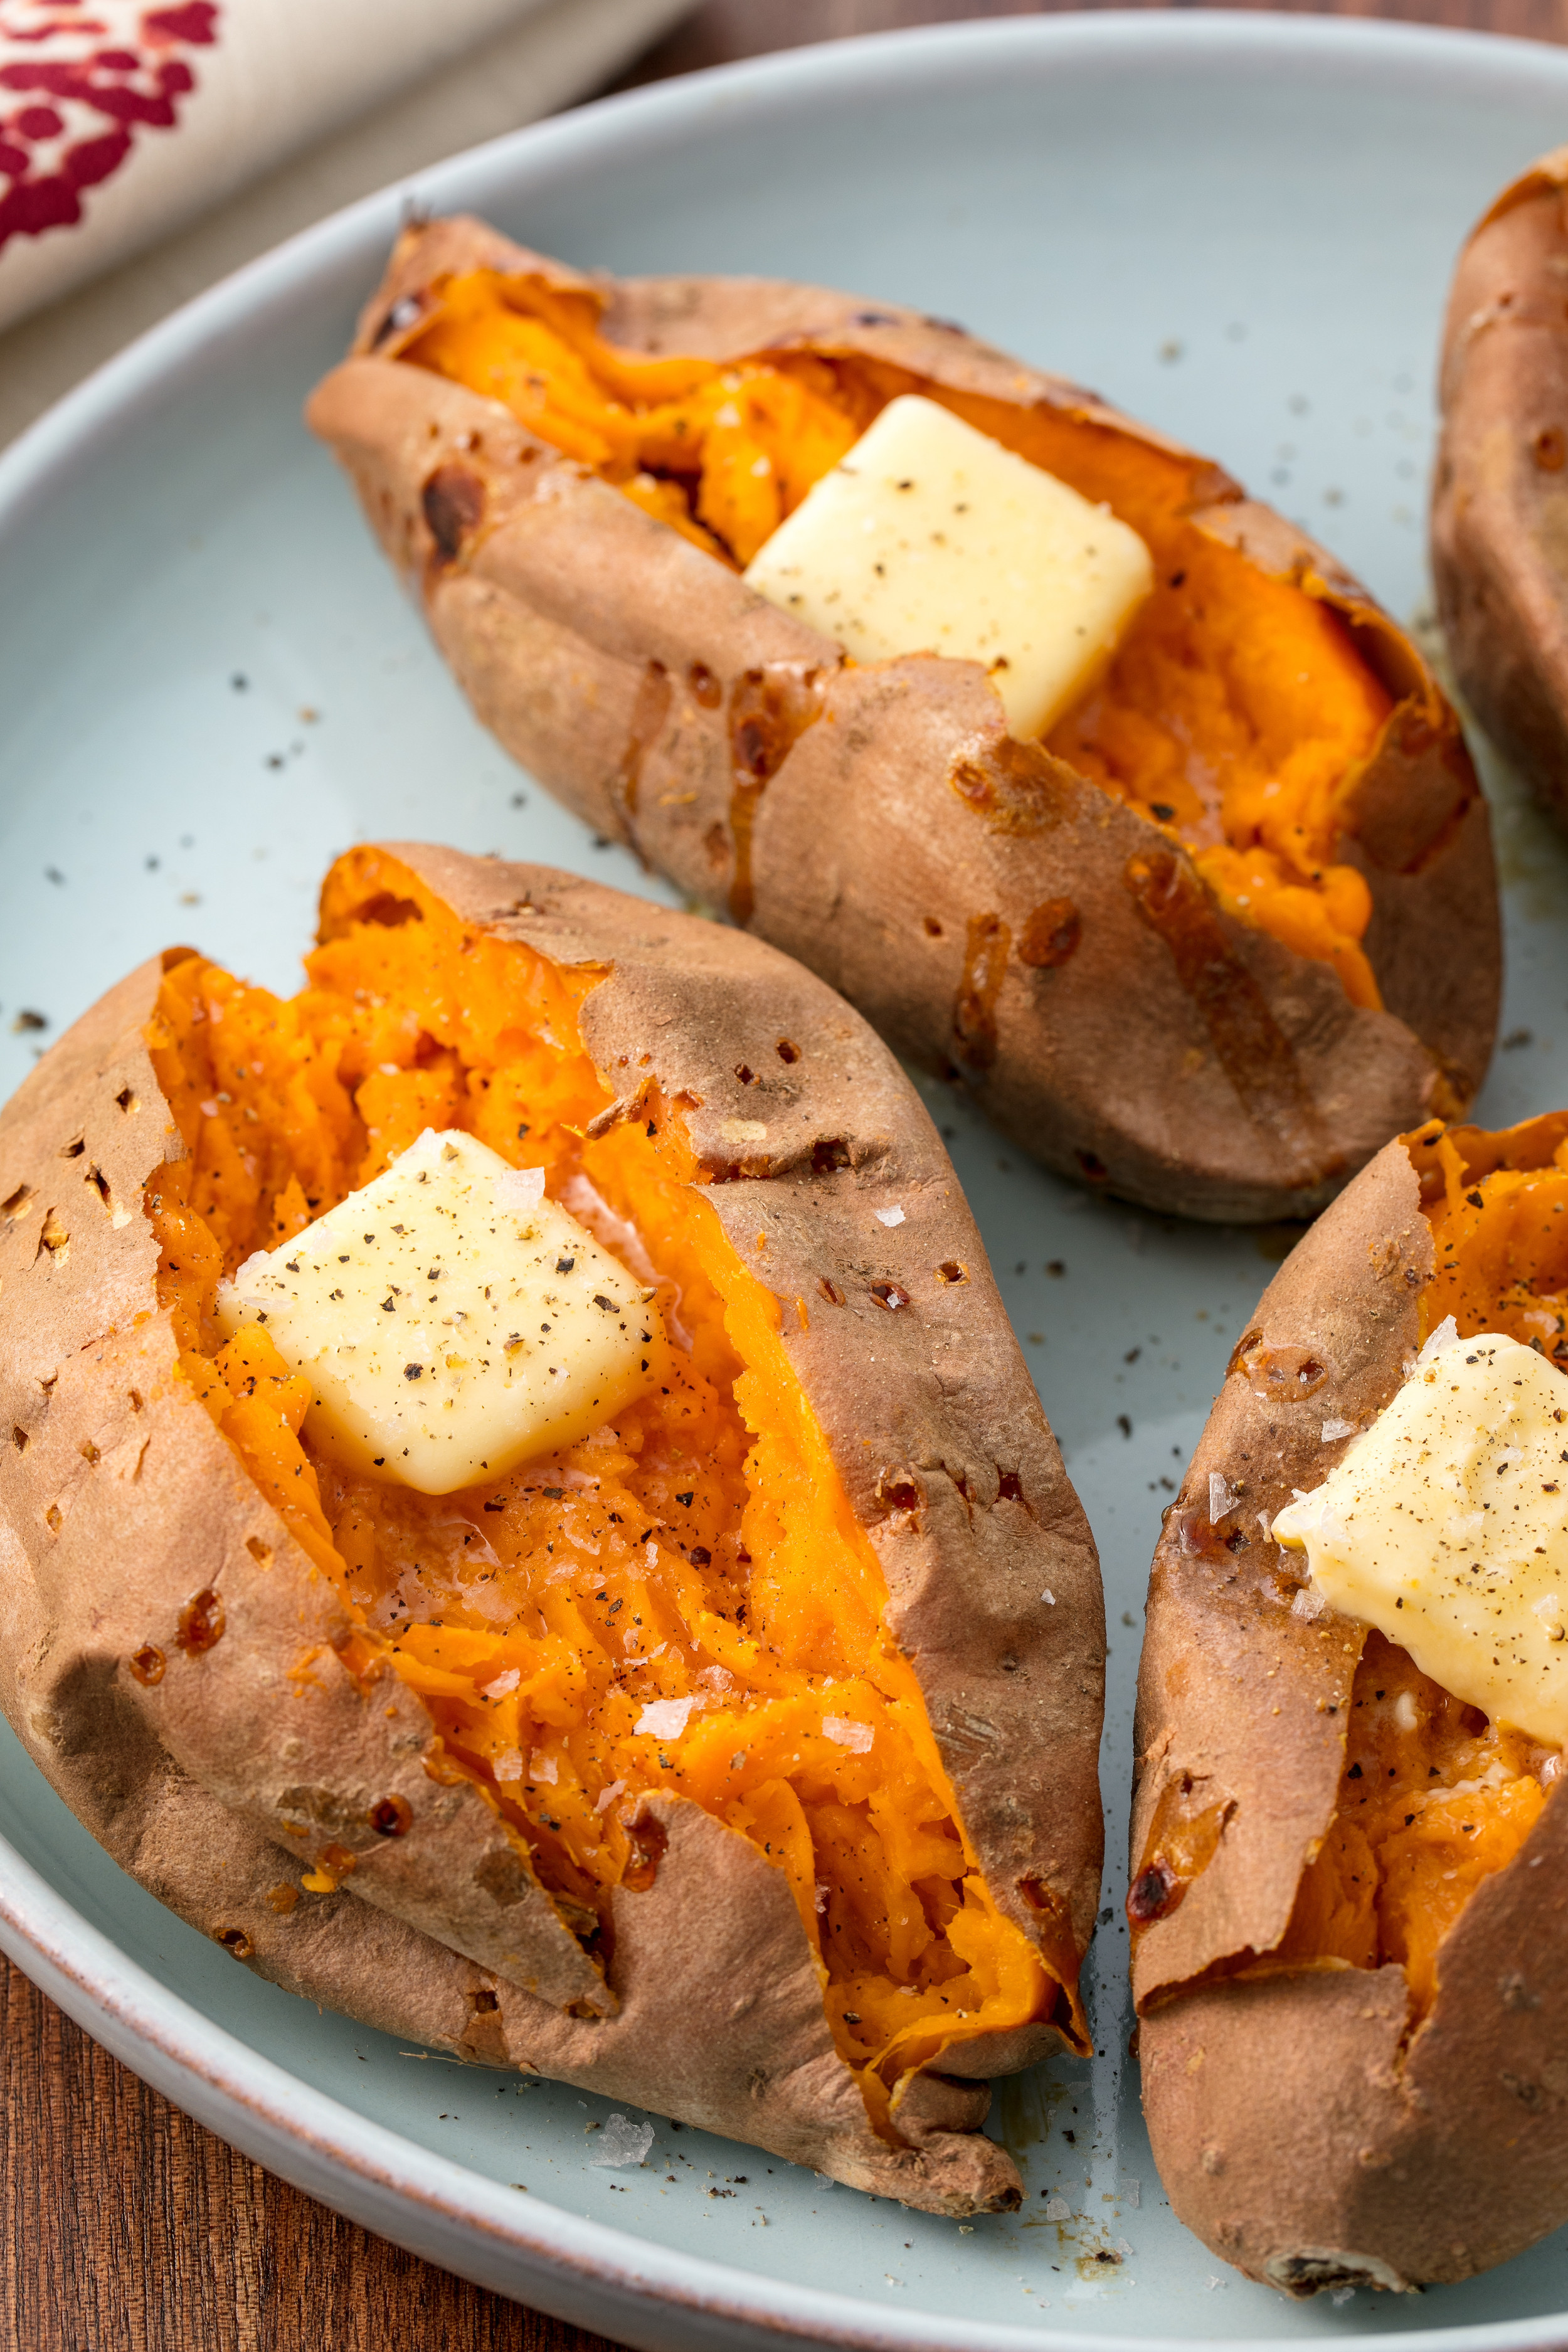 How To Make Sweet Potato  30 Best Baked Potato Recipes Fully Loaded Baked